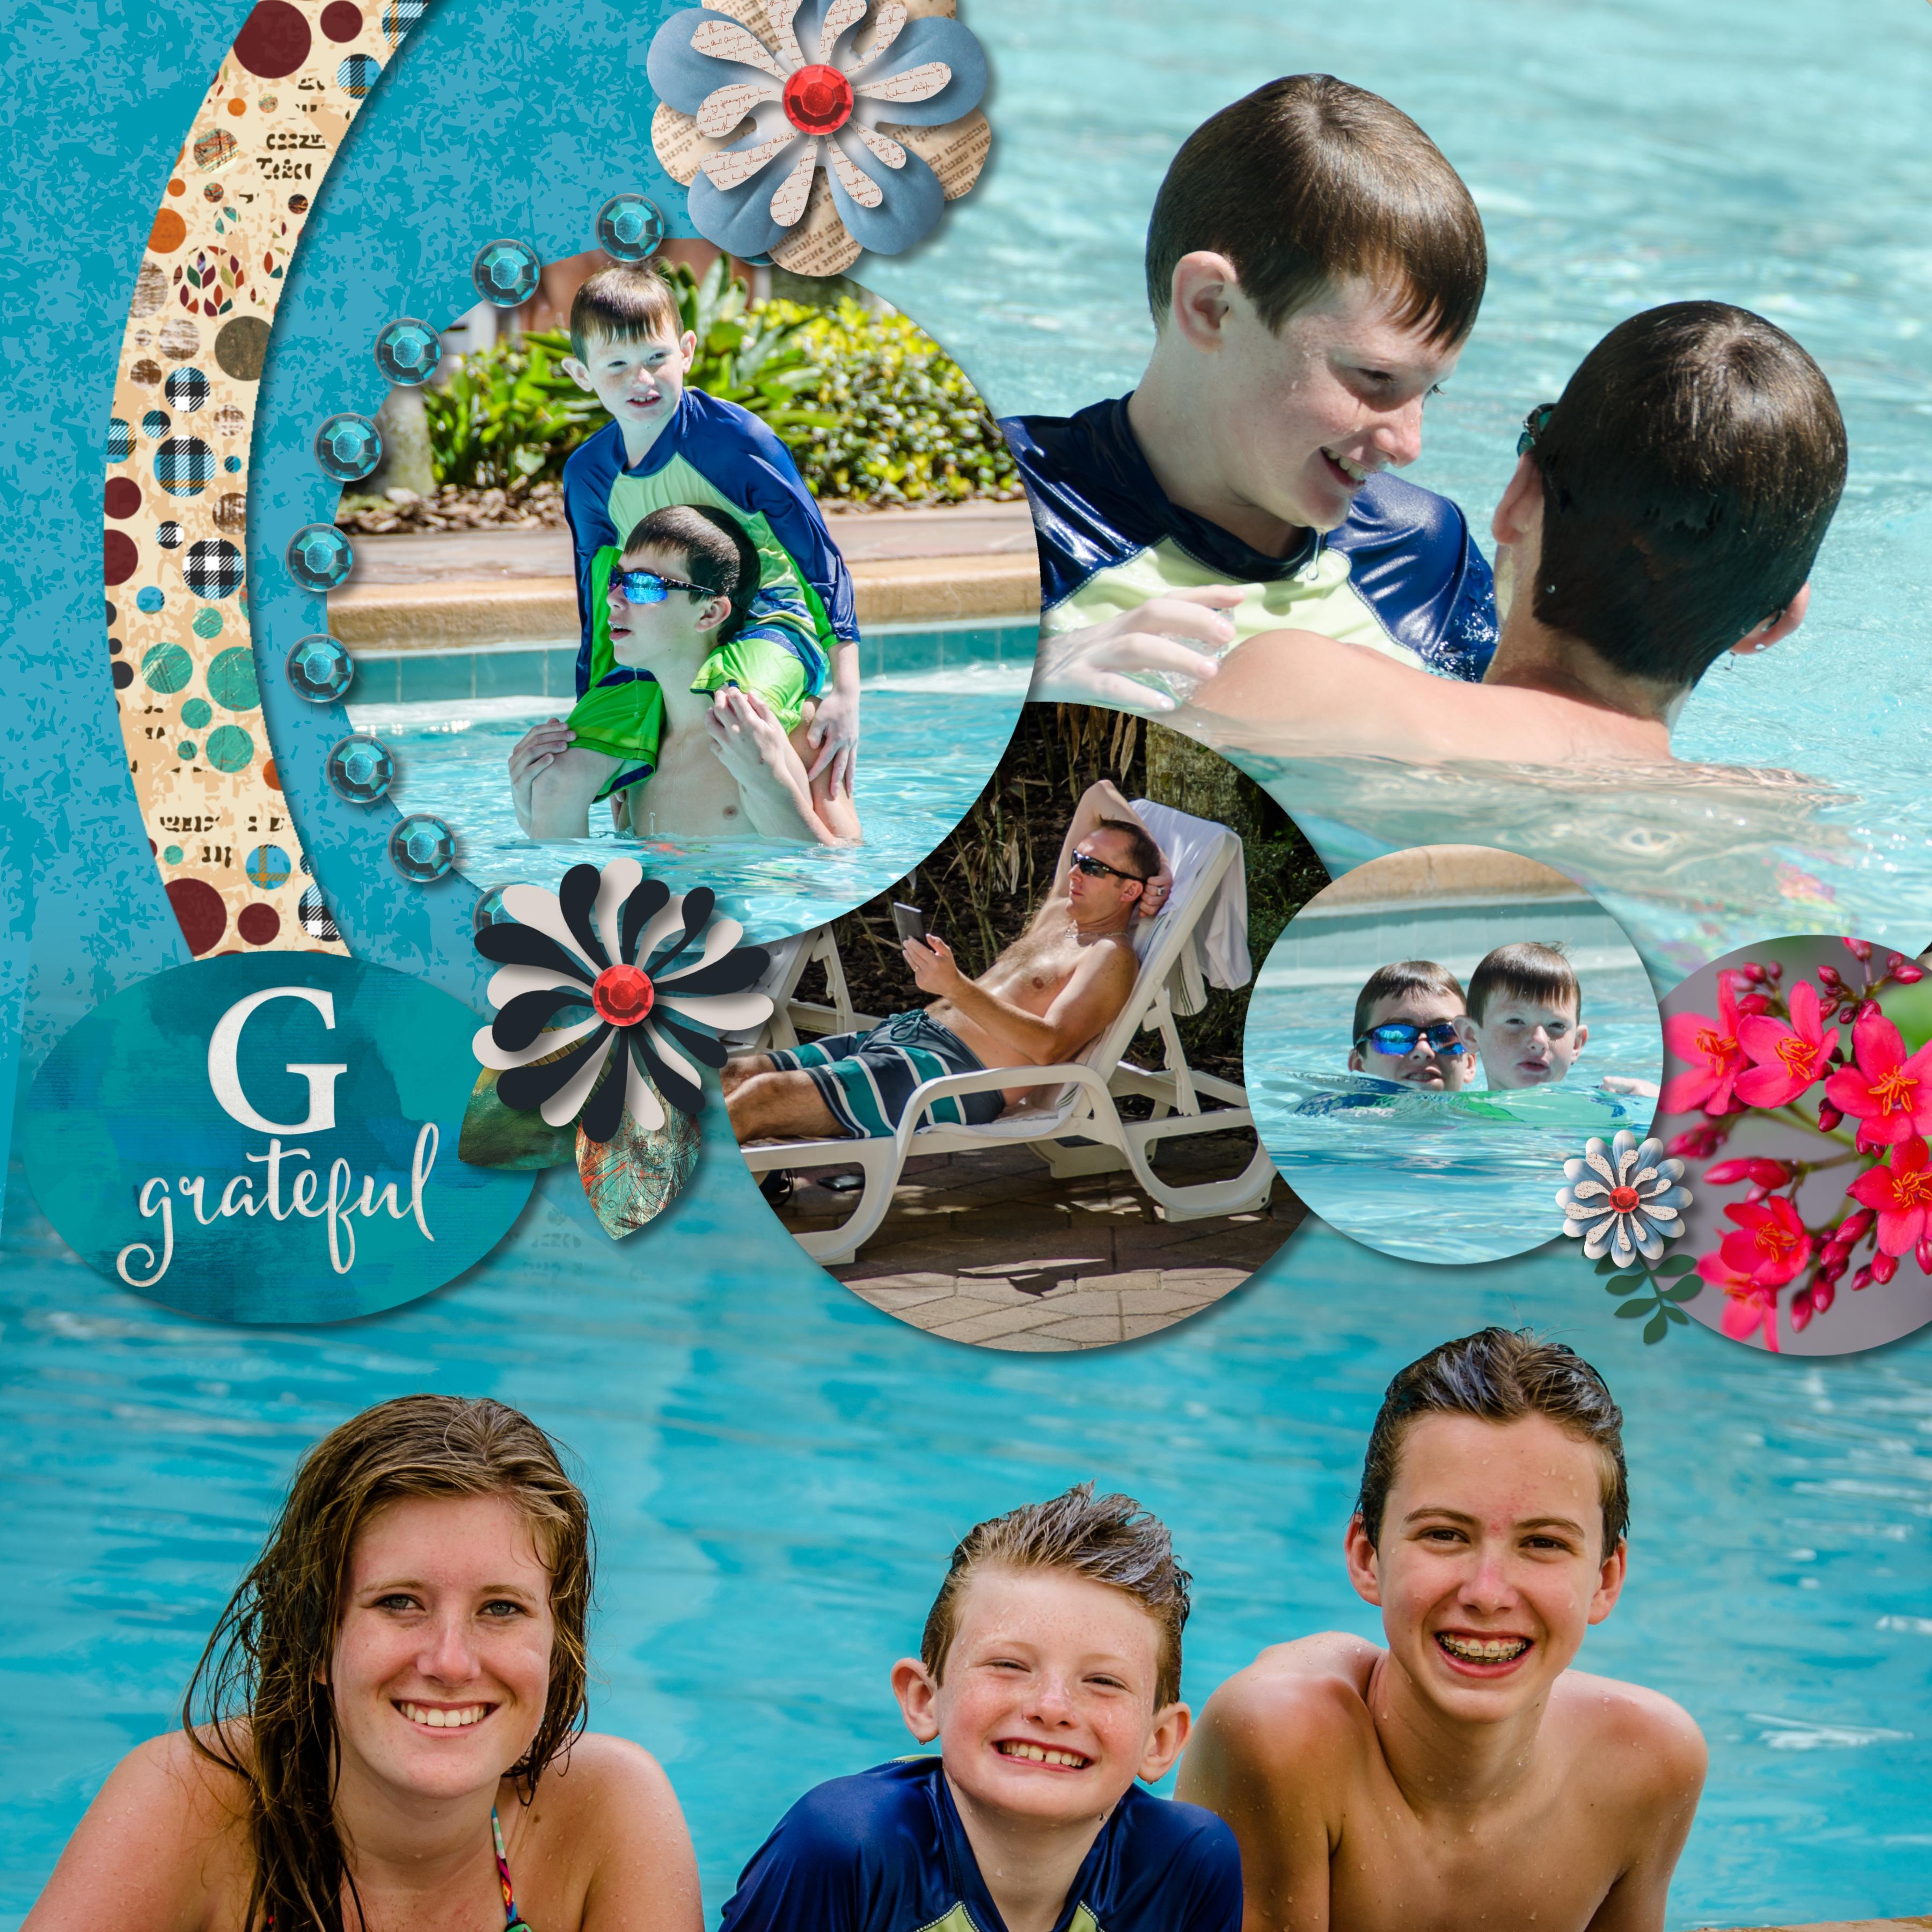 2014-florida-trip-page-011